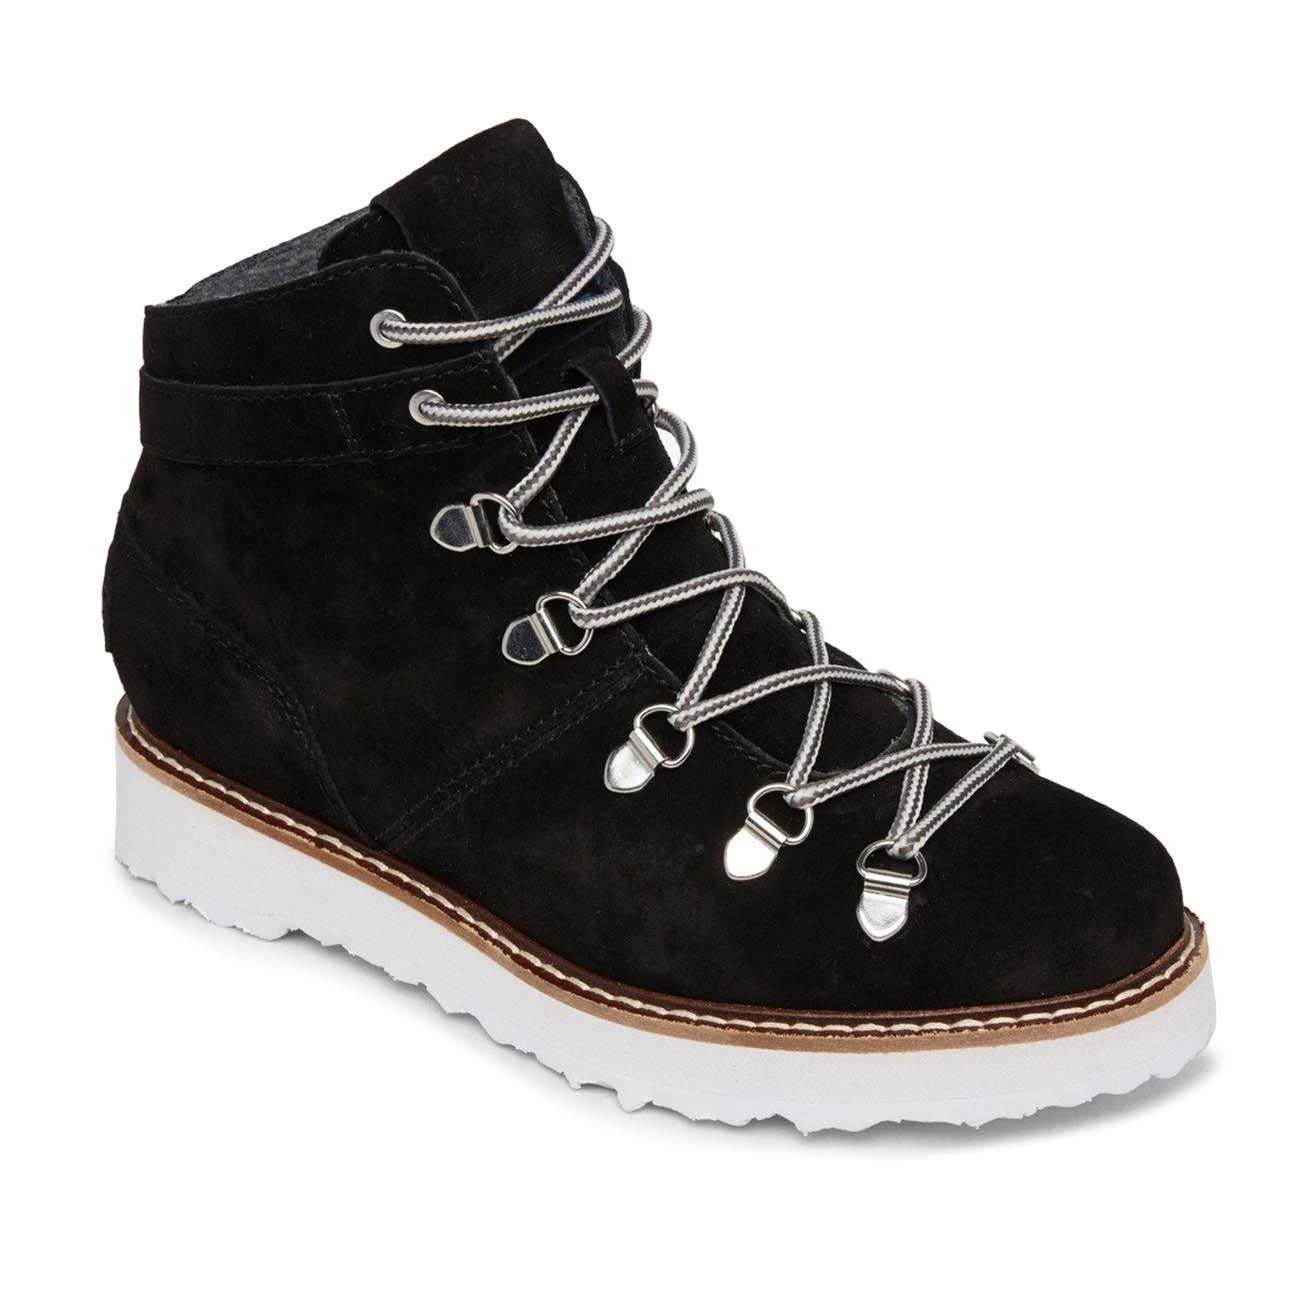 Winter shoes Roxy Spencir black